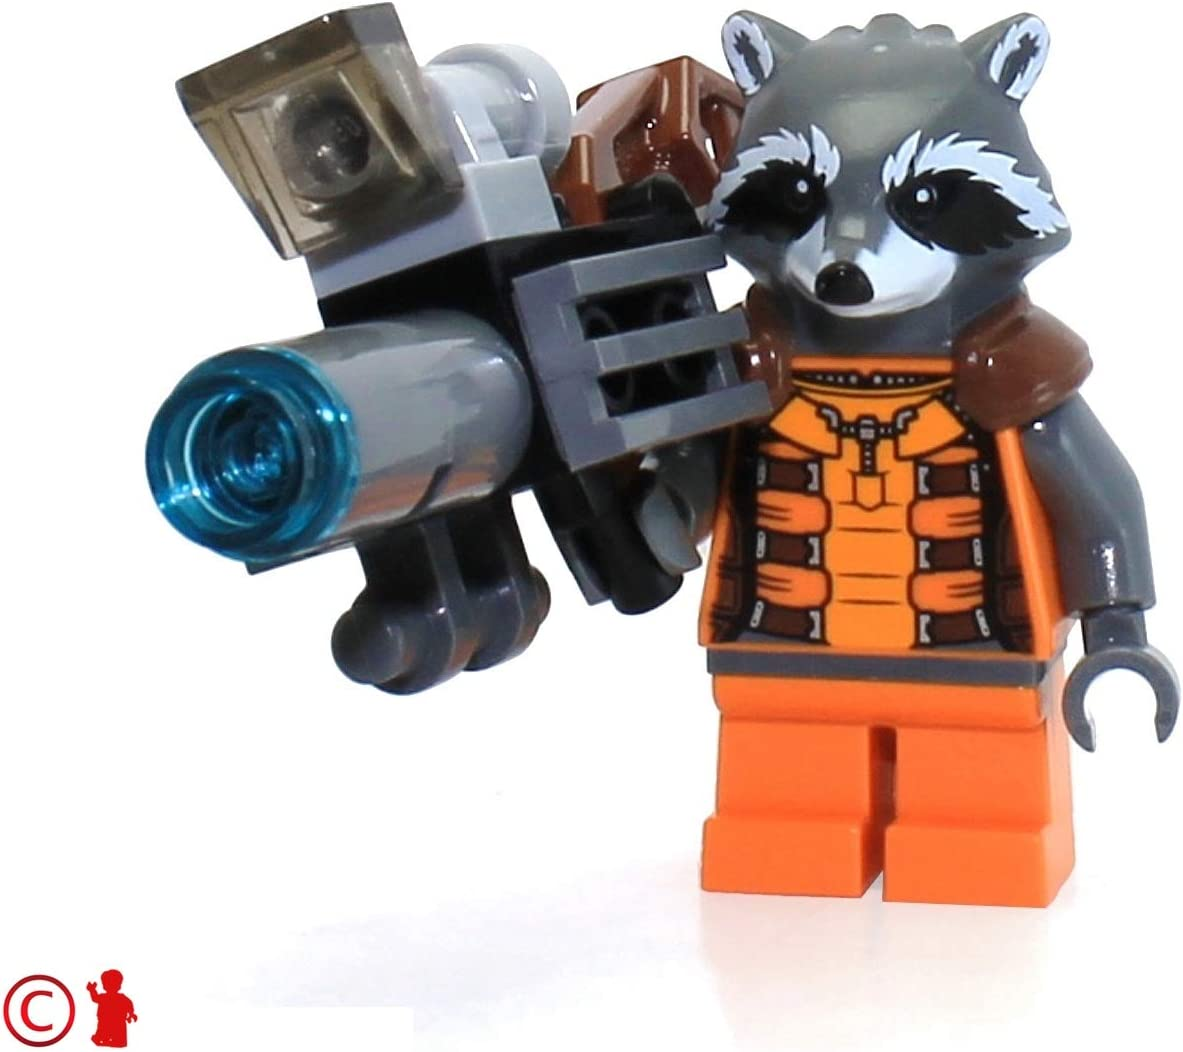 LEGO Super Heroes Guardians of the Galaxy Minifigure - Rocket Raccoon (76020)